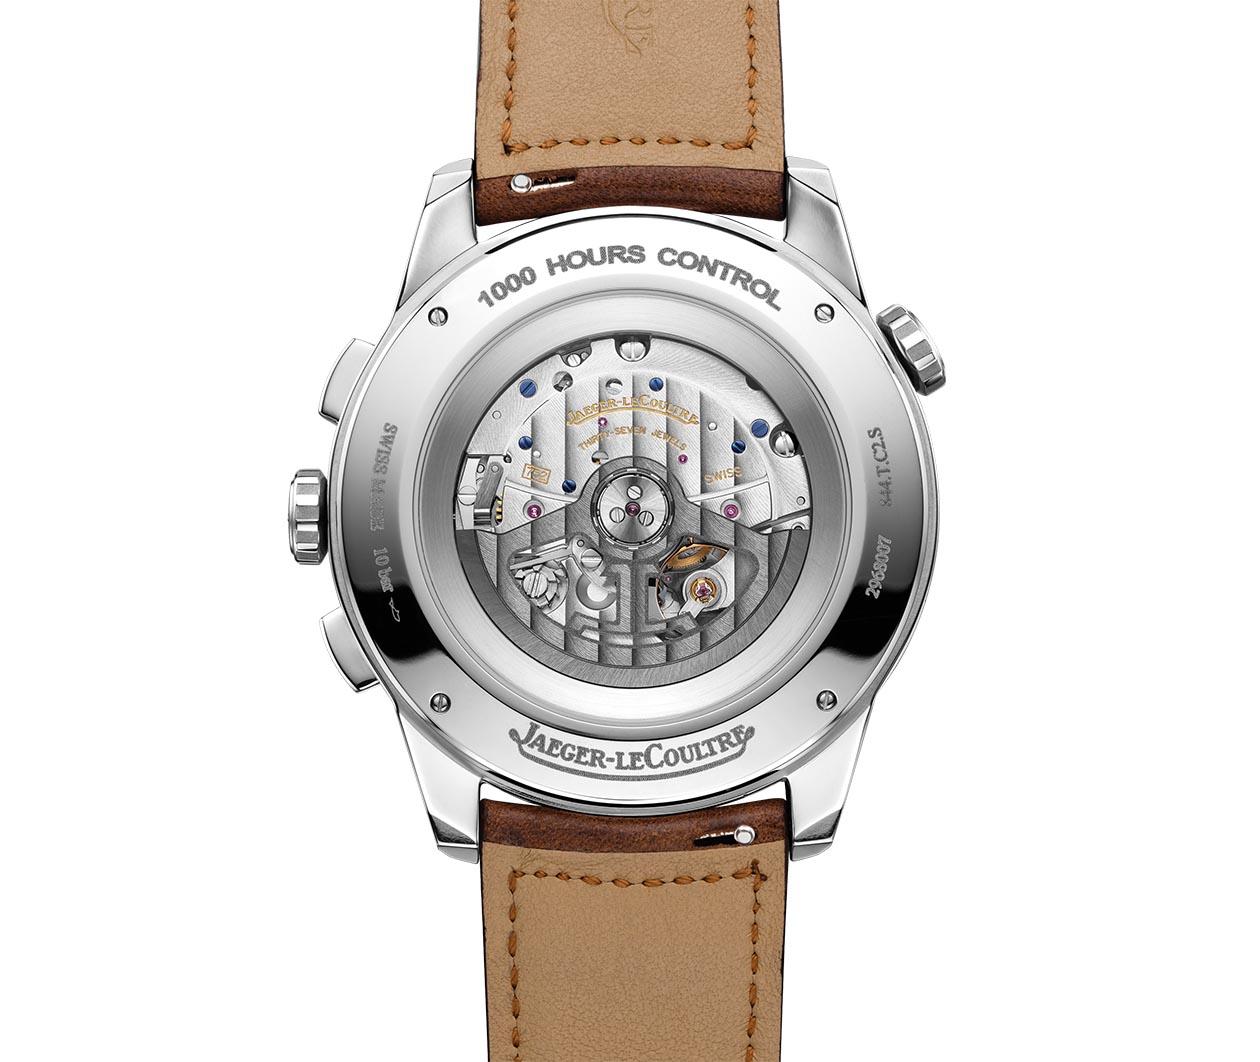 JaegerLeCoultre Polaris ChronographWT 905T471 Carousel 3 FINAL